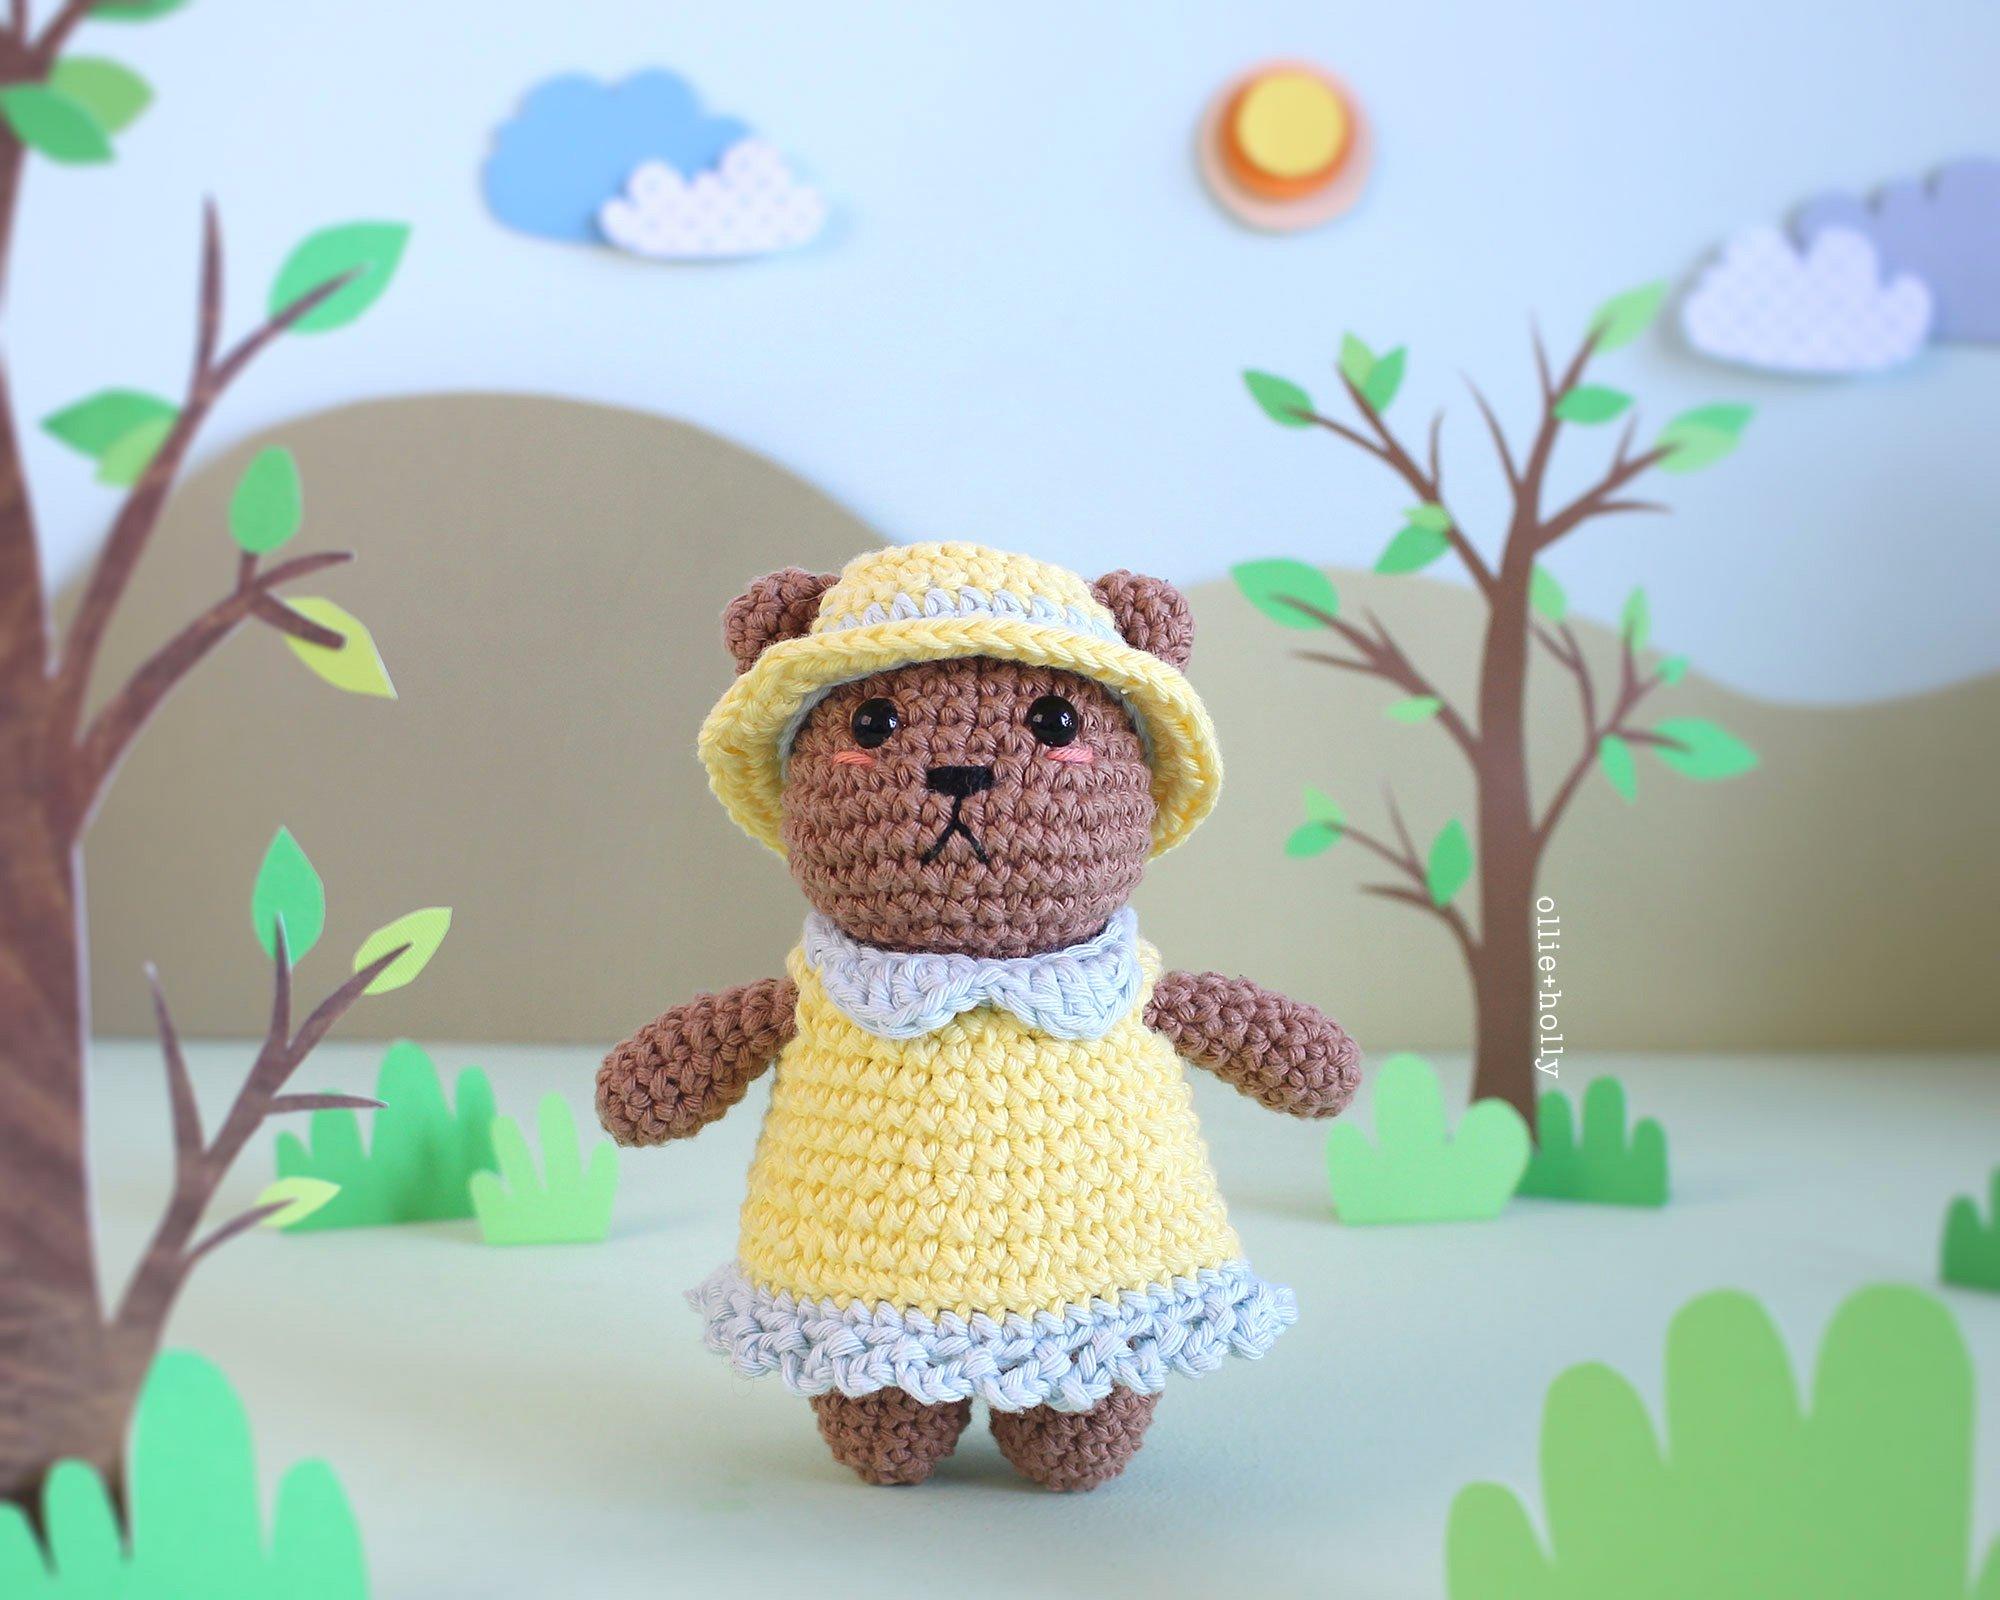 Free Bernadette the Bear Stuffed Animal Amigurumi Crochet Pattern Close Up